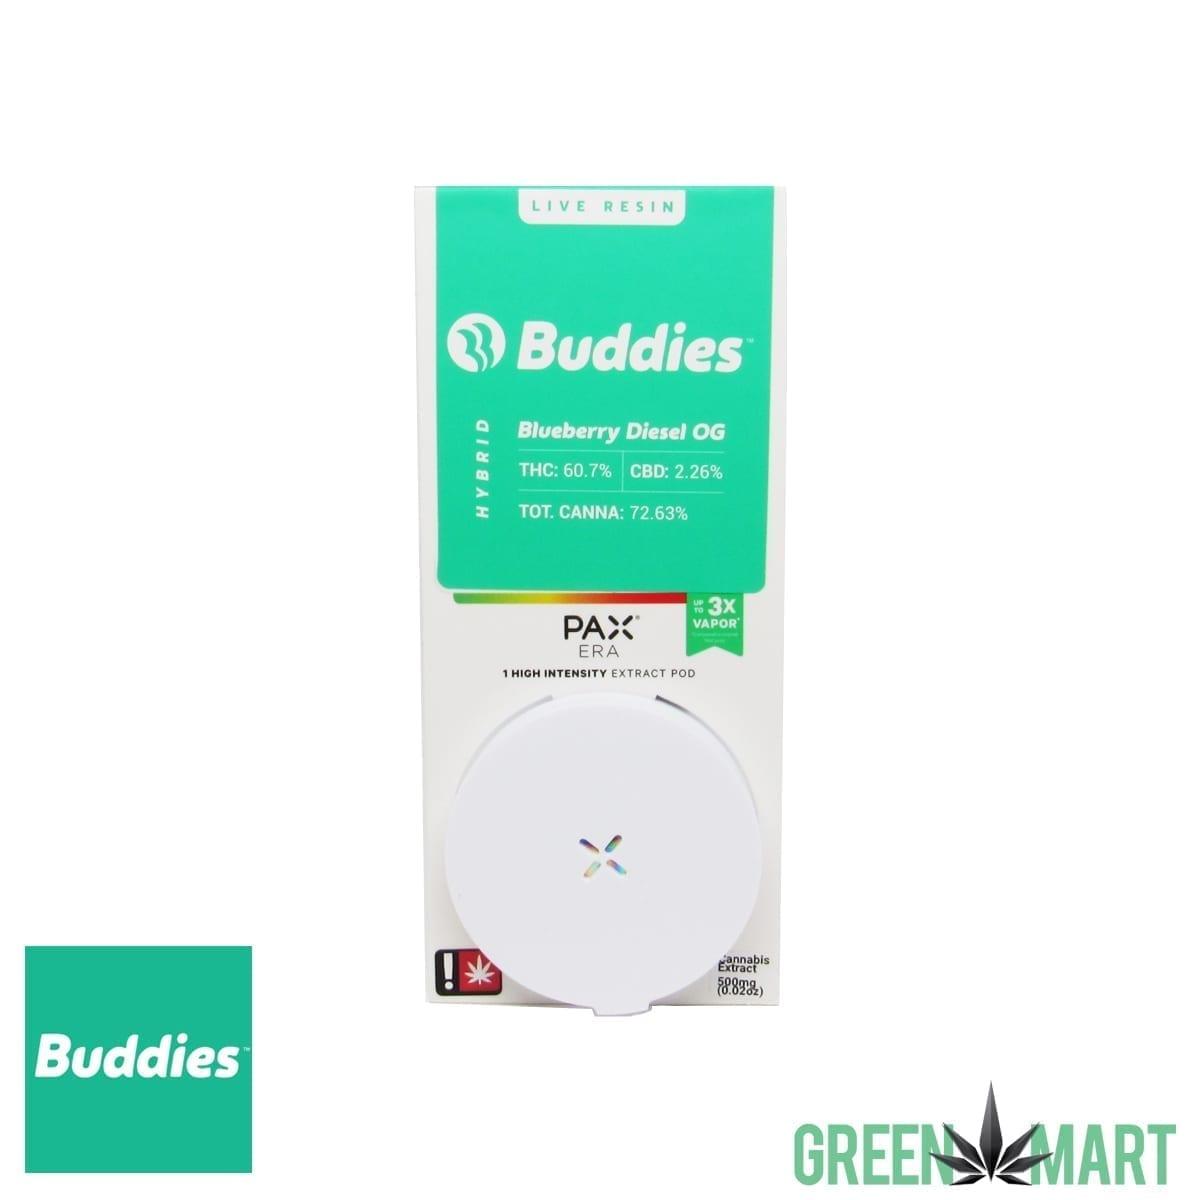 Buddies Brand Pax Pod – Blueberry Diesel OG Live Resin